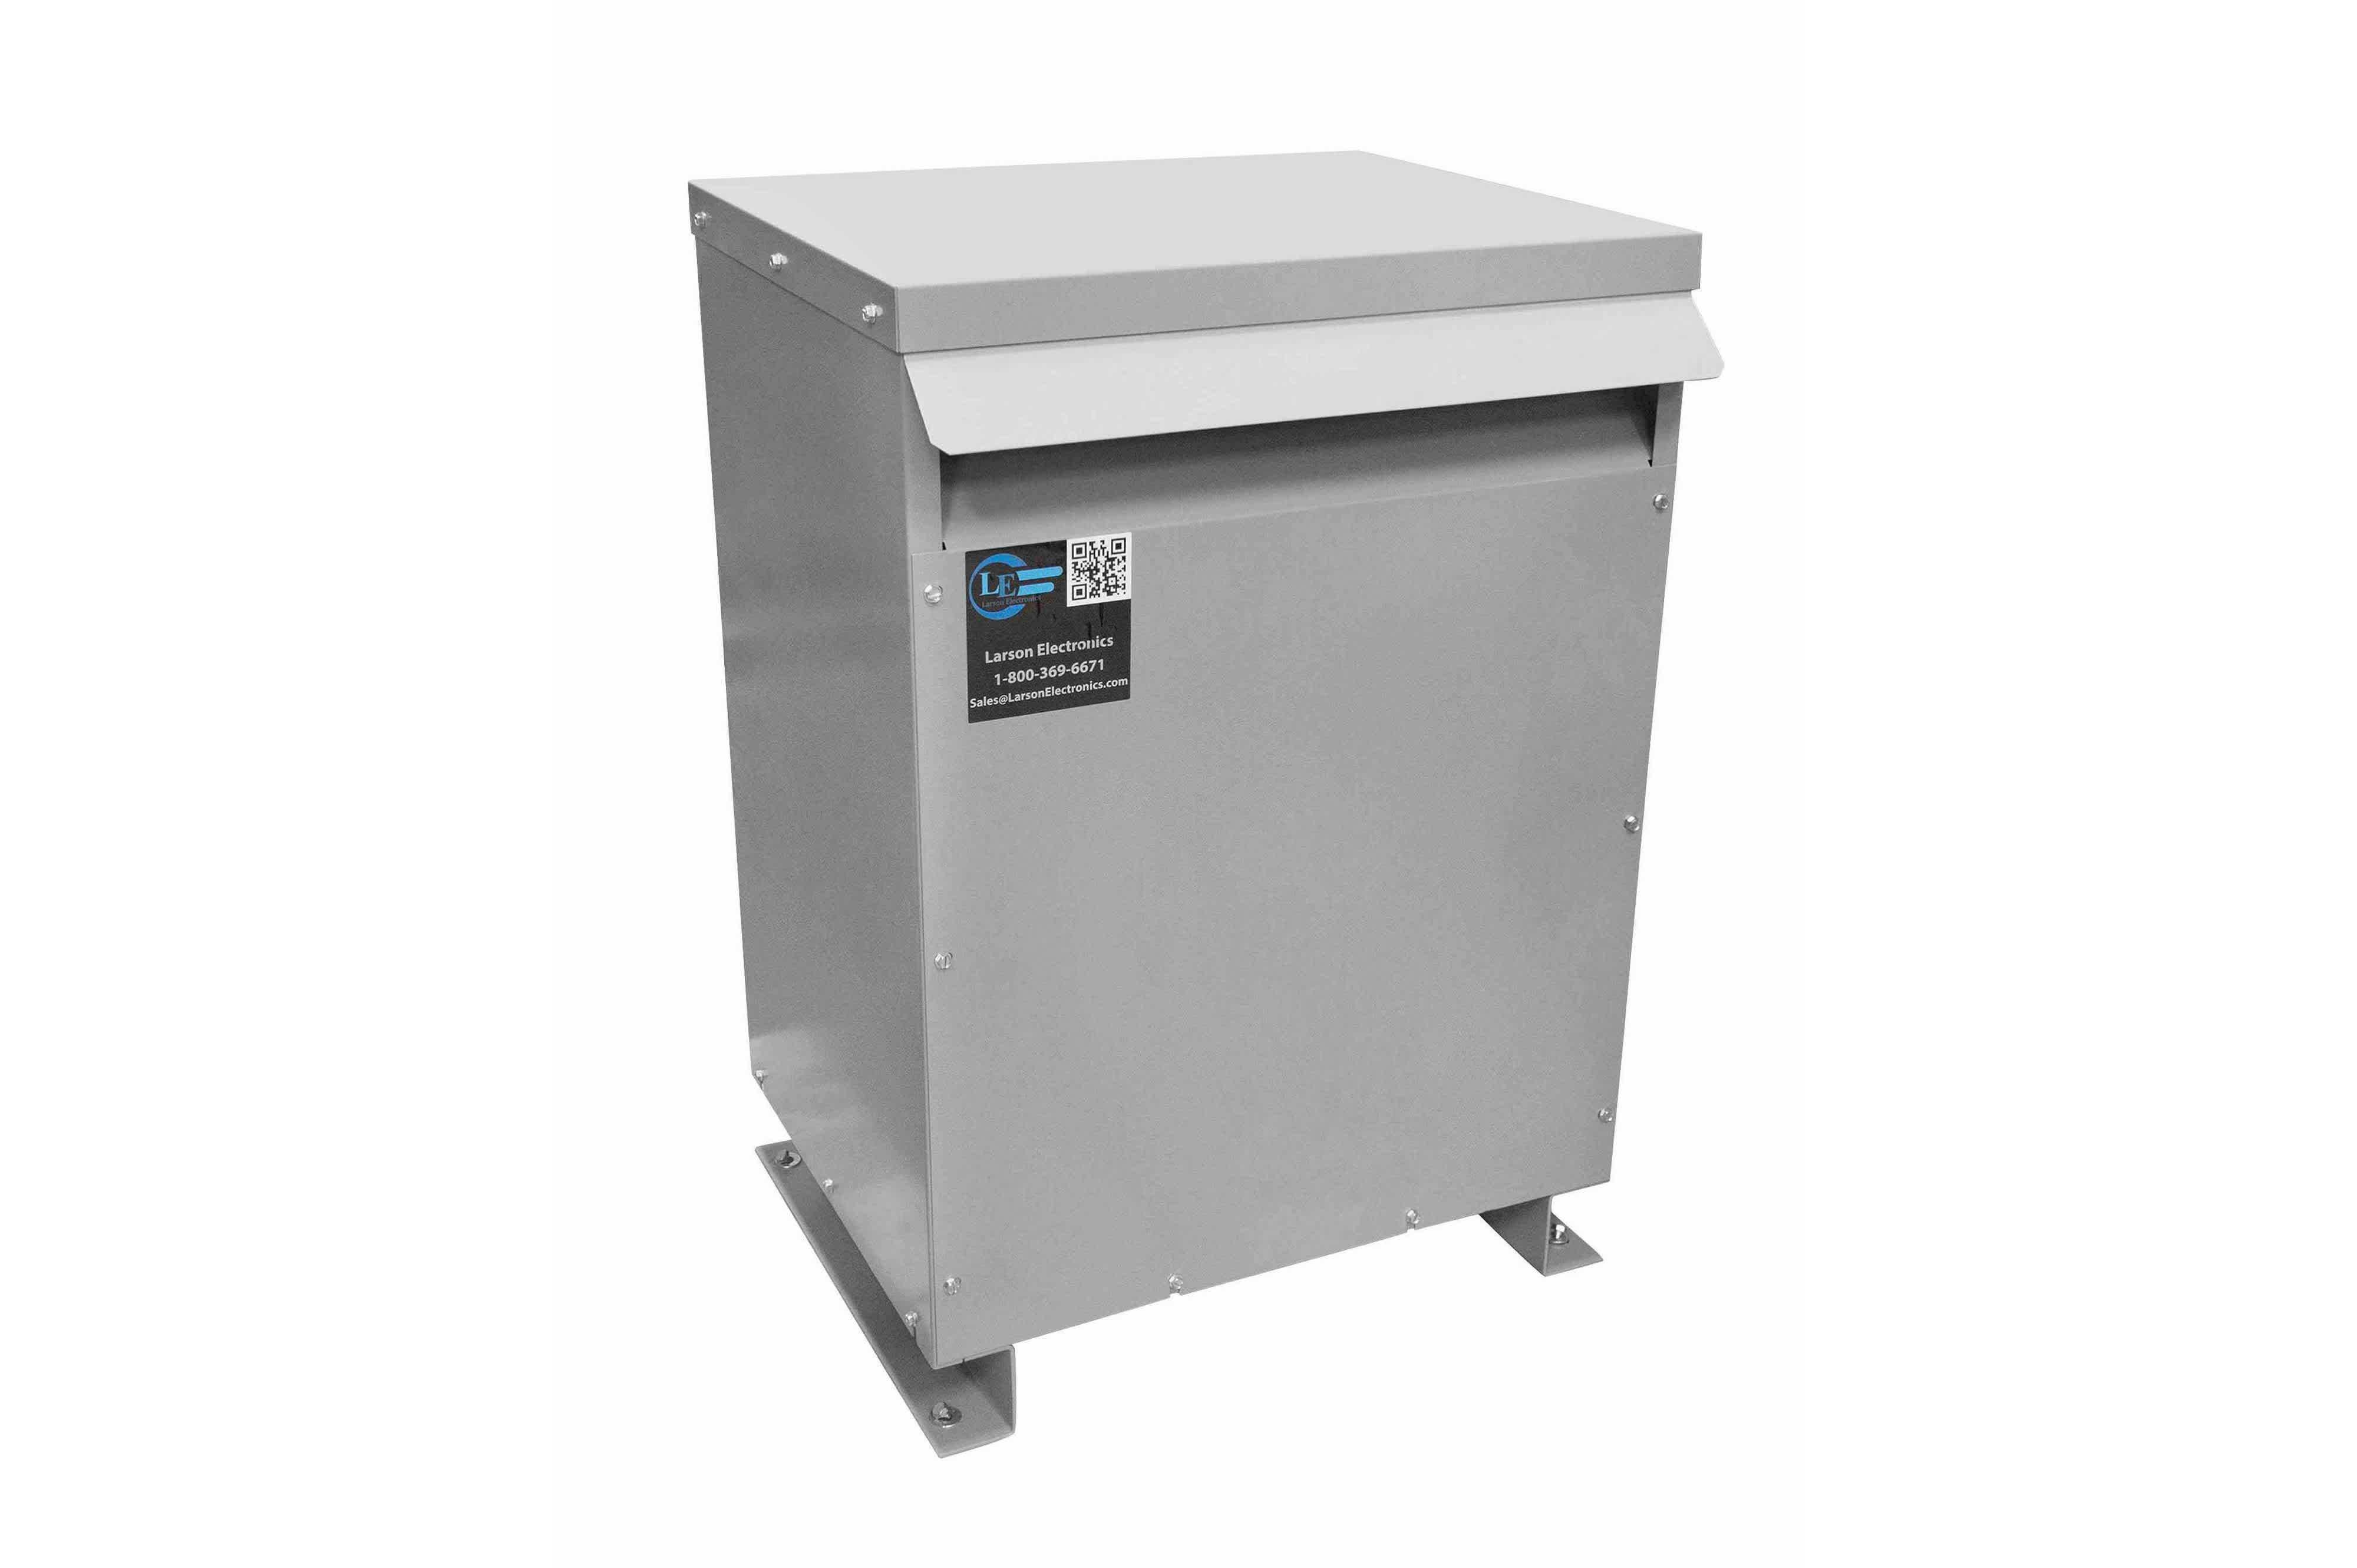 60 kVA 3PH DOE Transformer, 575V Delta Primary, 208Y/120 Wye-N Secondary, N3R, Ventilated, 60 Hz